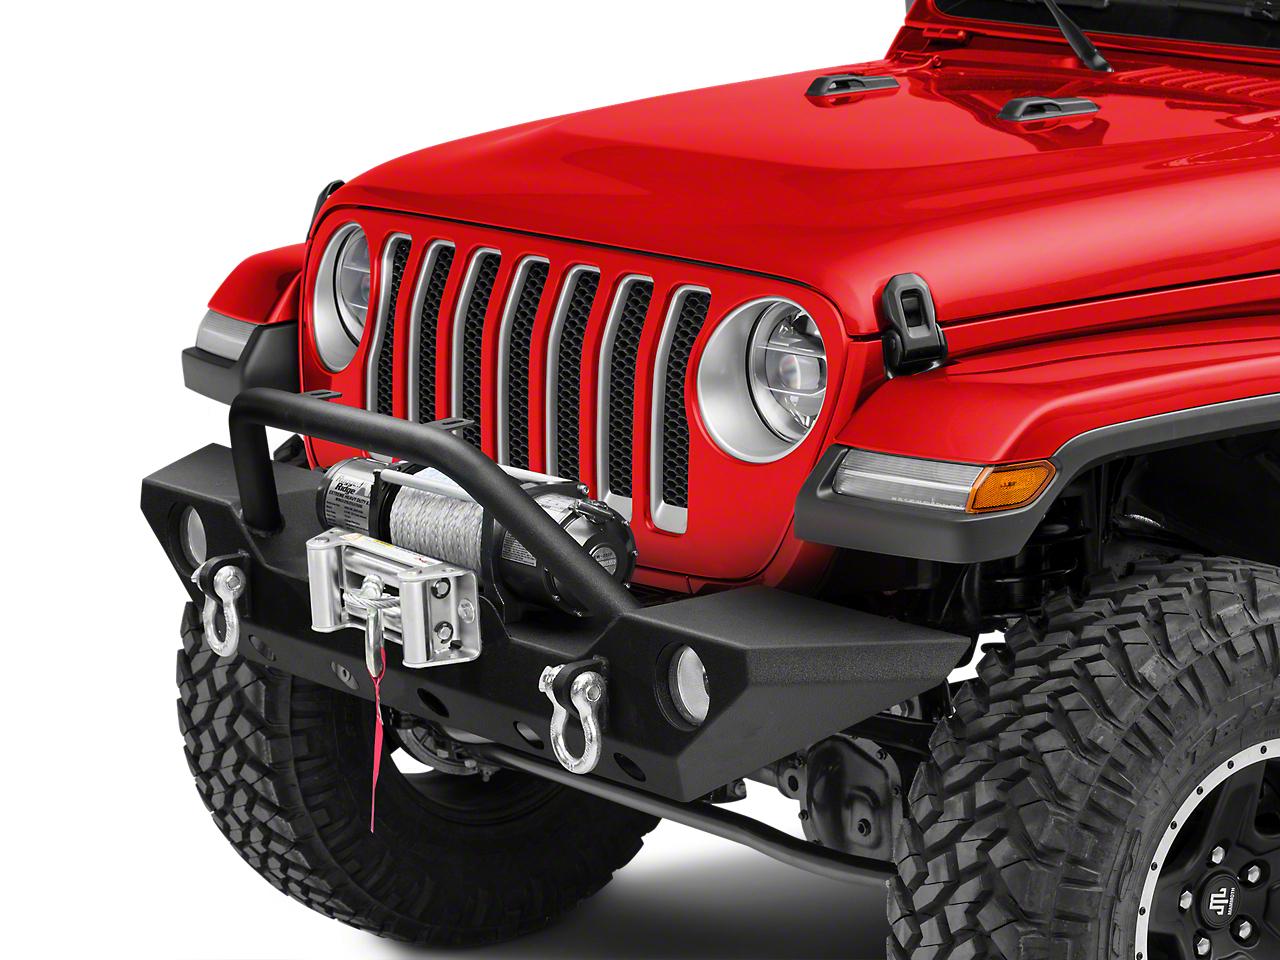 Barricade Trail Force HD Front Bumper & 9,500 lb. Winch Combo (2018 Wrangler JL)